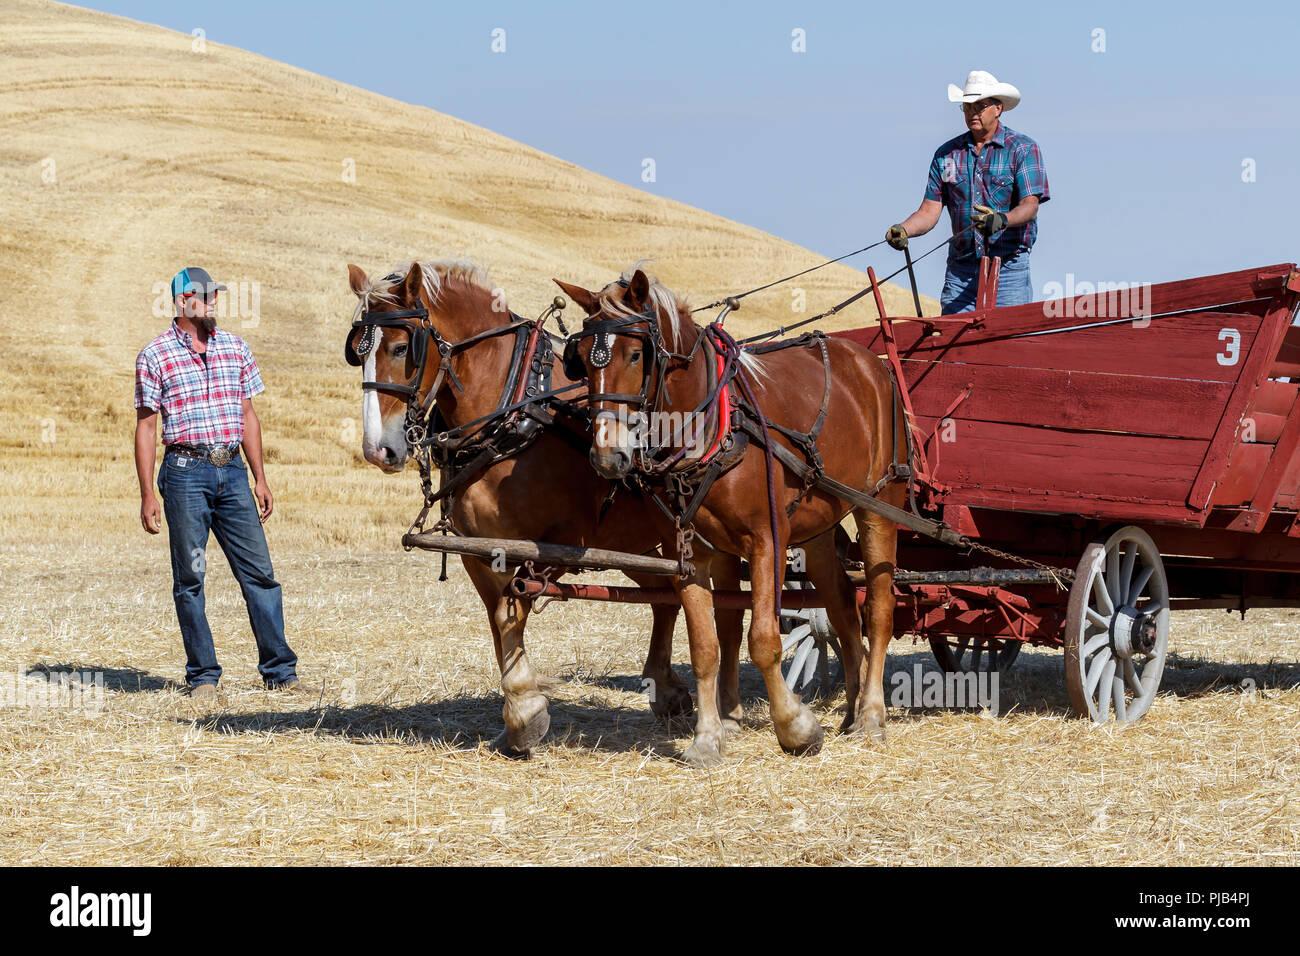 Colfax, Washington USA - 09-03-2018. Editorial photo of men driving draft horses to pull a wagon at the annual Colfax threshing bee in Colfax, Washing - Stock Image